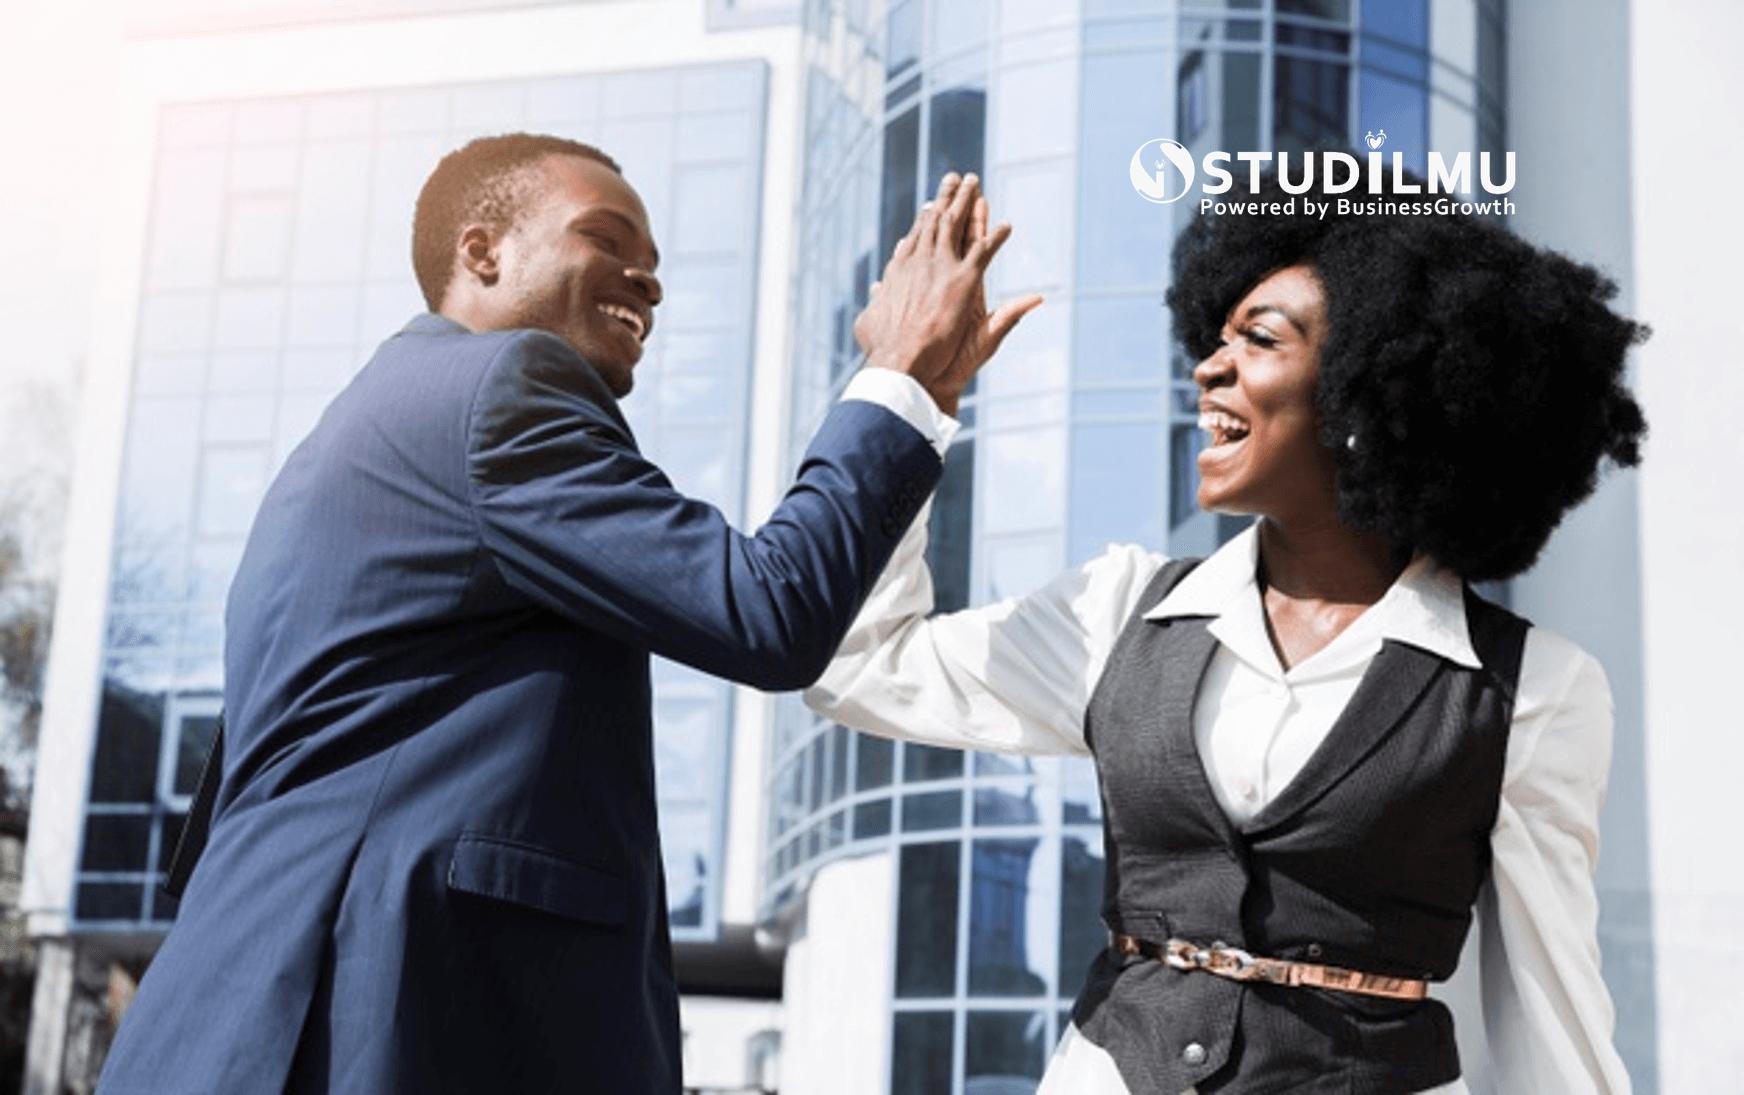 STUDILMU Career Advice - 3 Manfaat Menjadikan Rasa Syukur sebagai Budaya Kerja